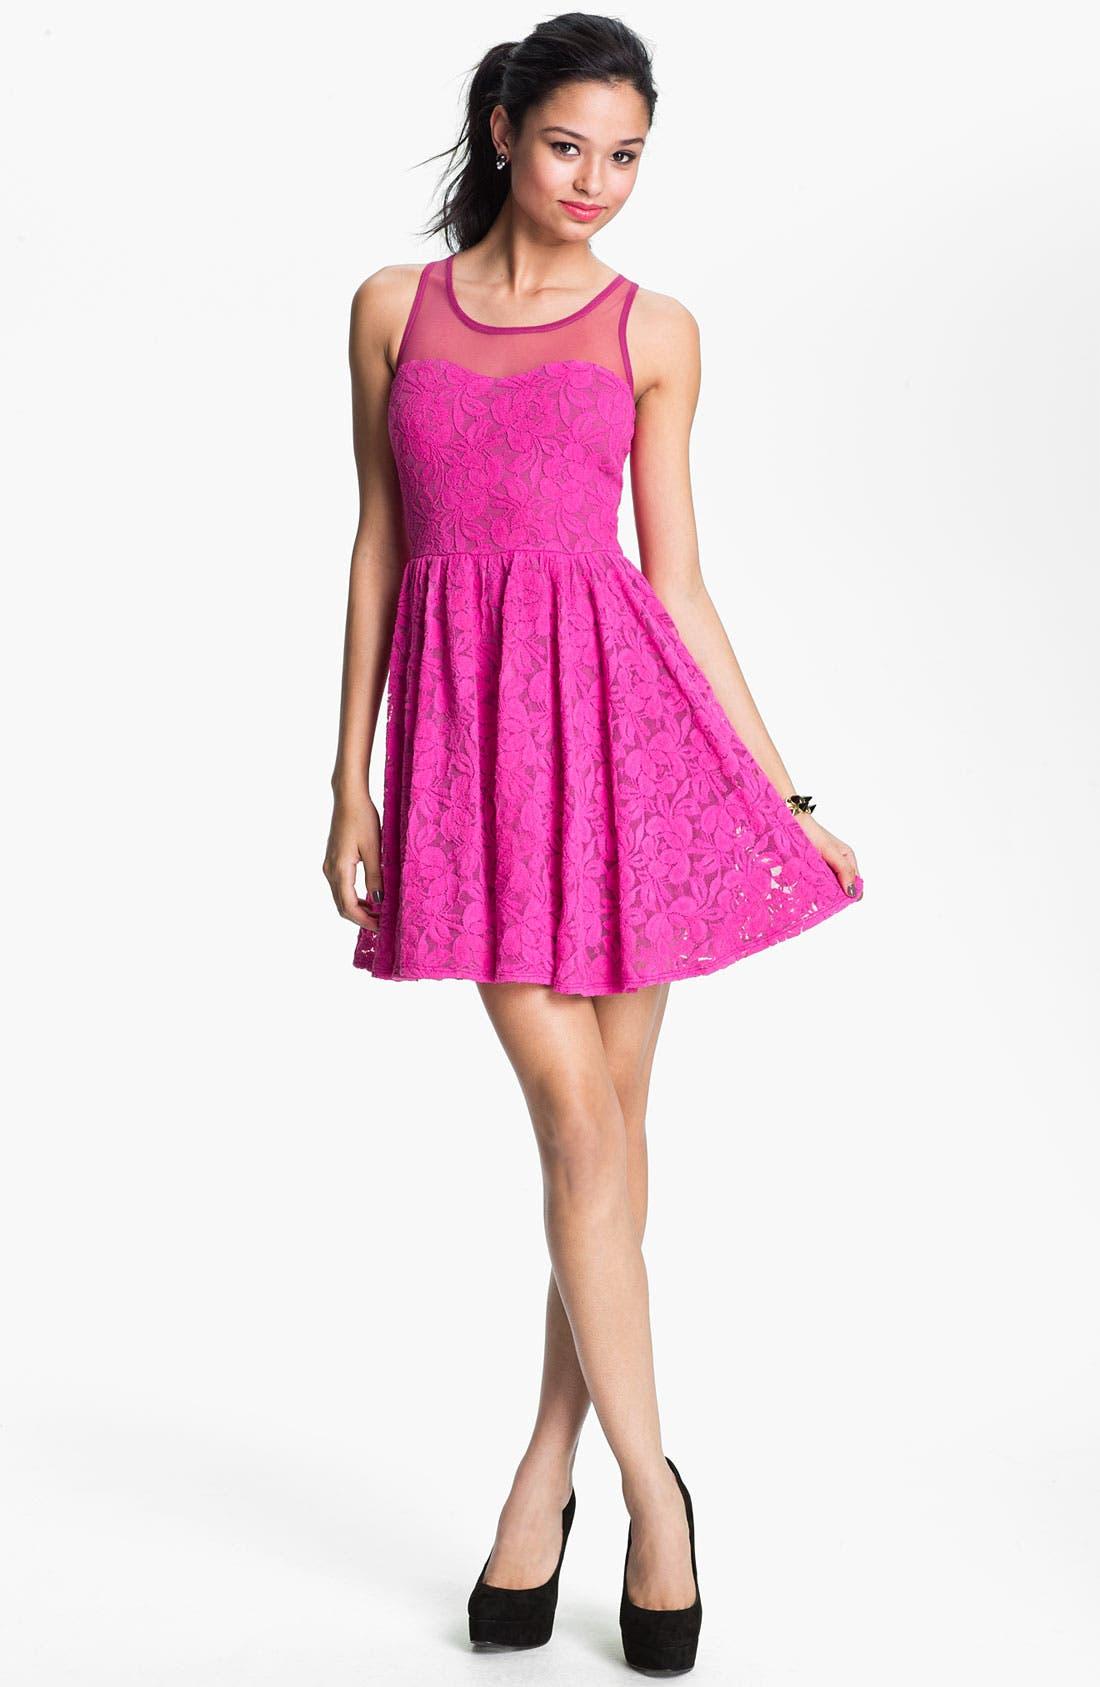 Alternate Image 1 Selected - Fire Lace Skater Dress (Juniors)